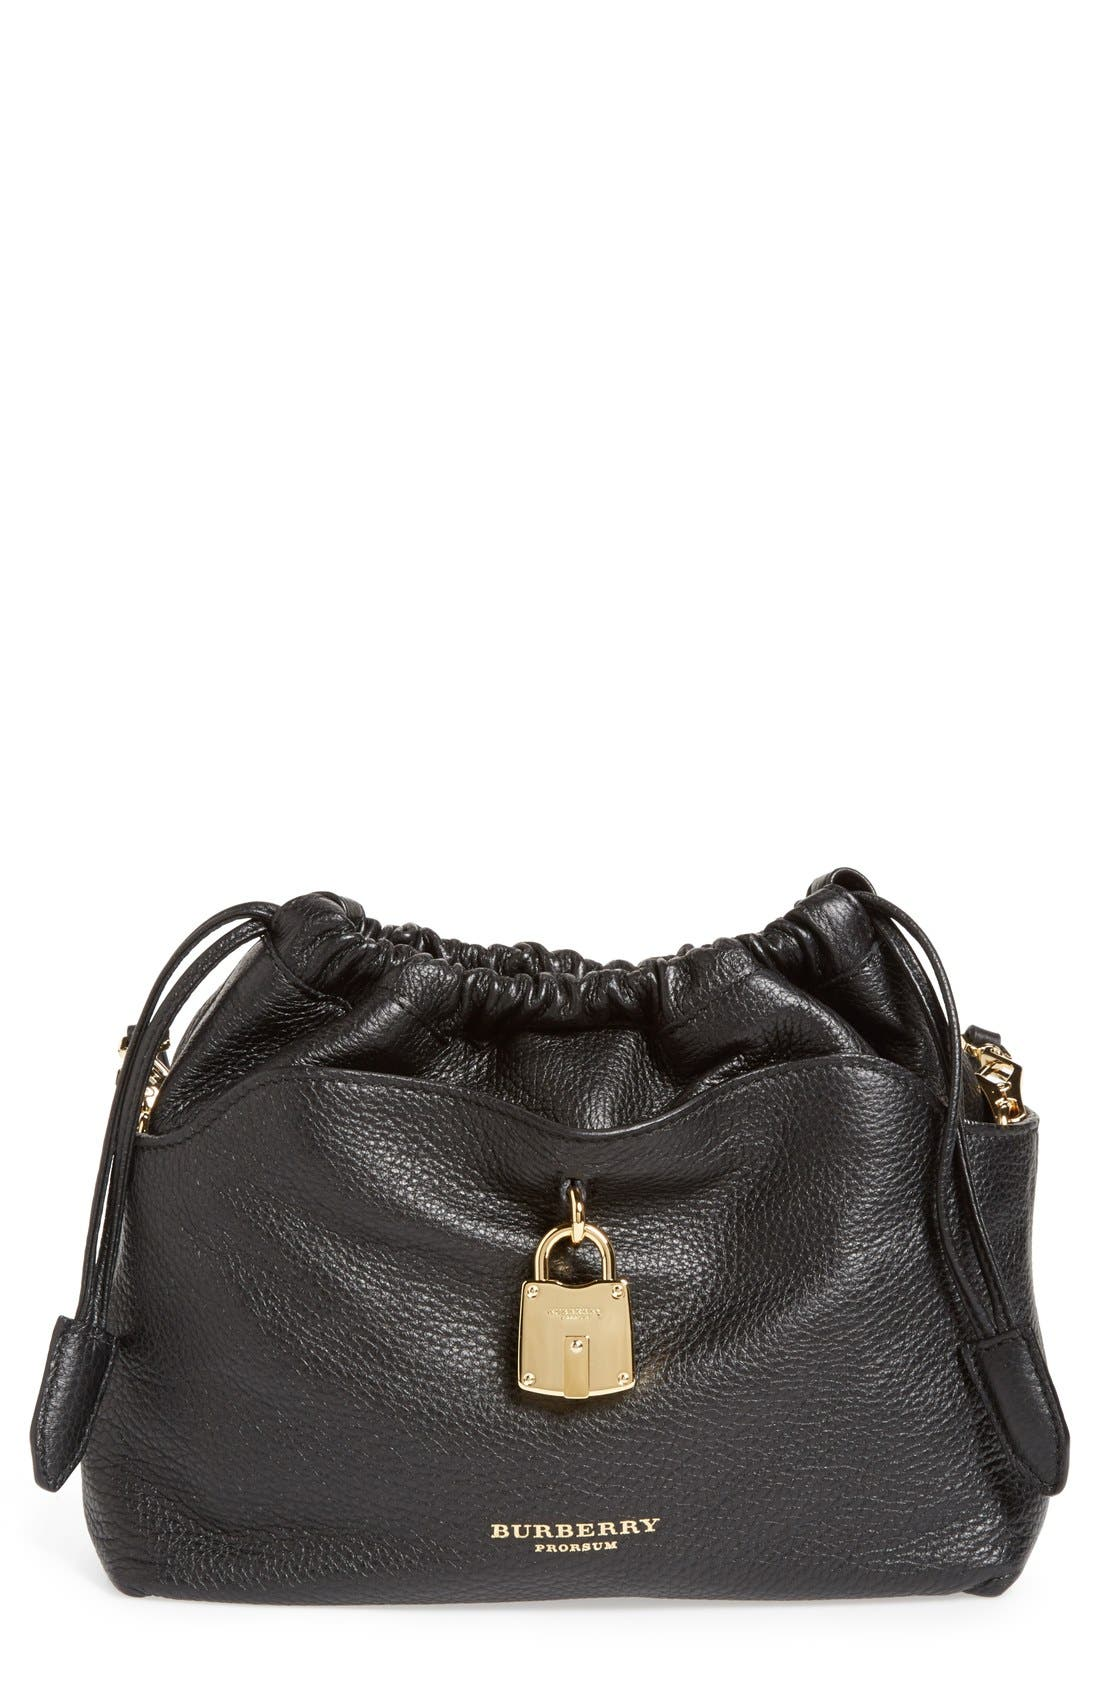 Main Image - Burberry 'Little Crush' Crossbody Bag